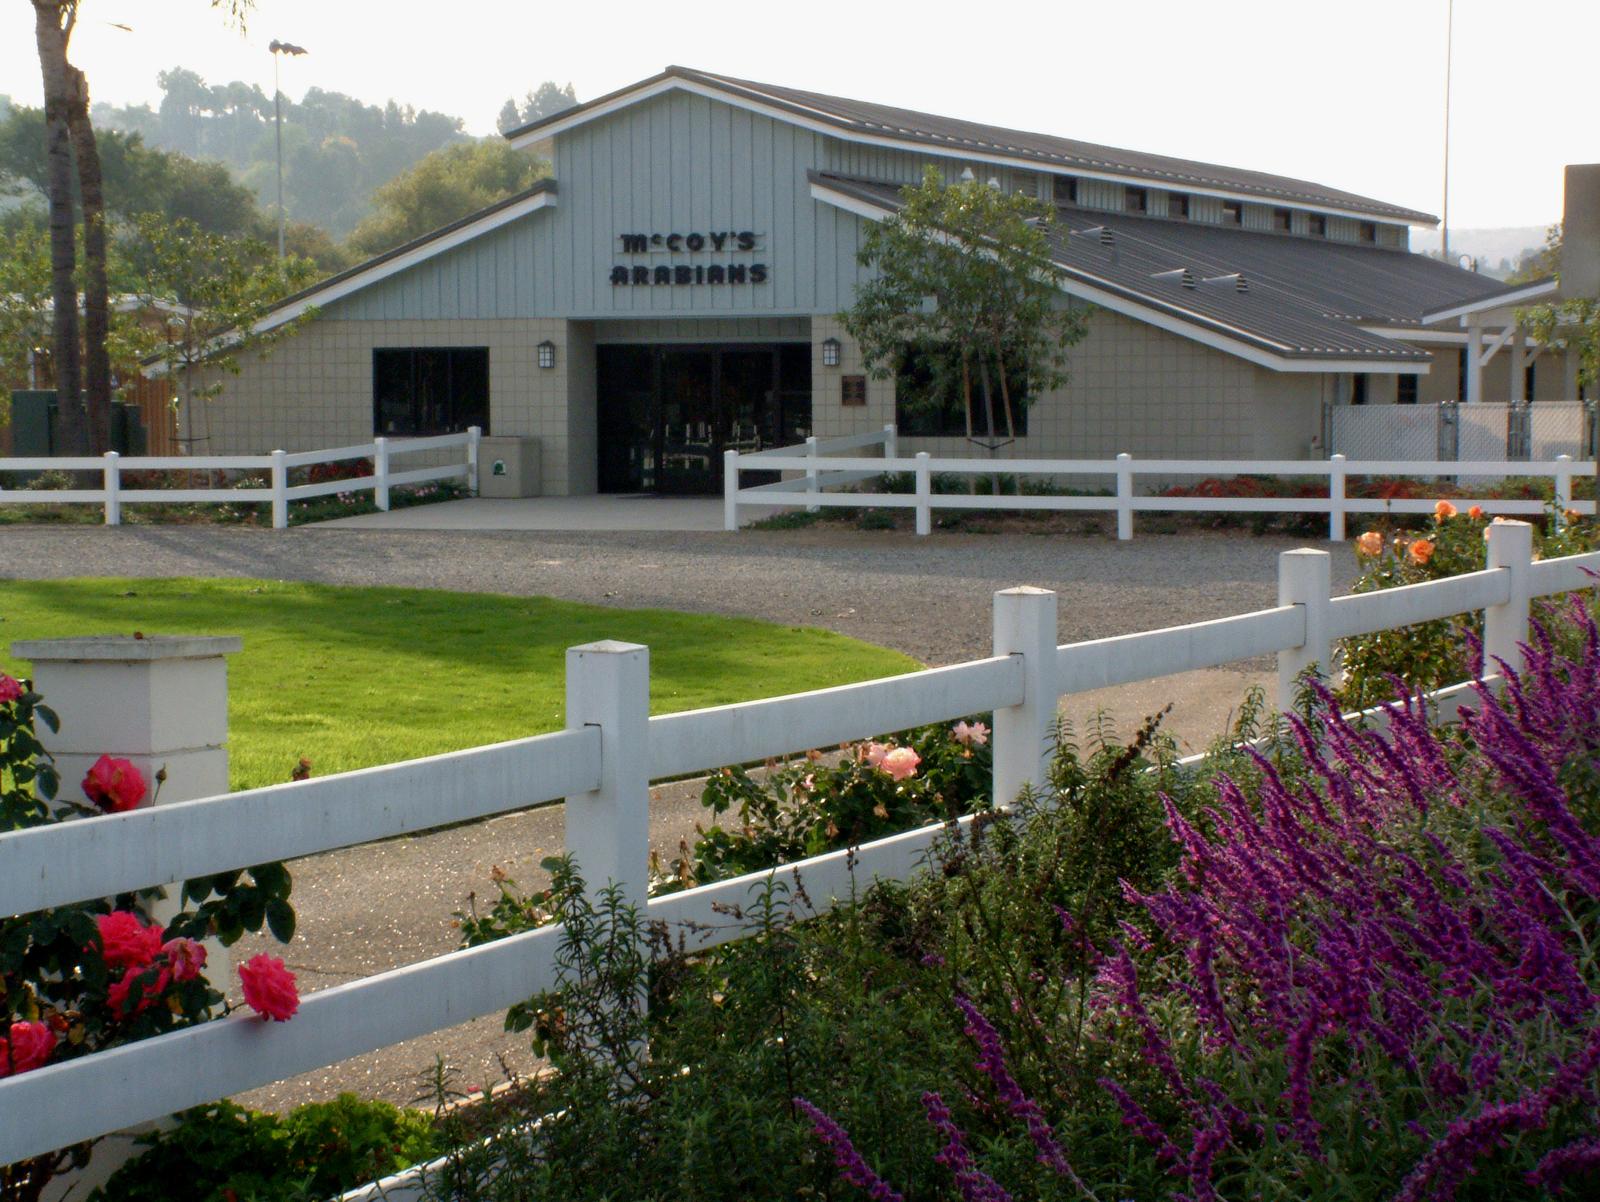 Chino Hills, CA - Official Website - McCoy Equestrian